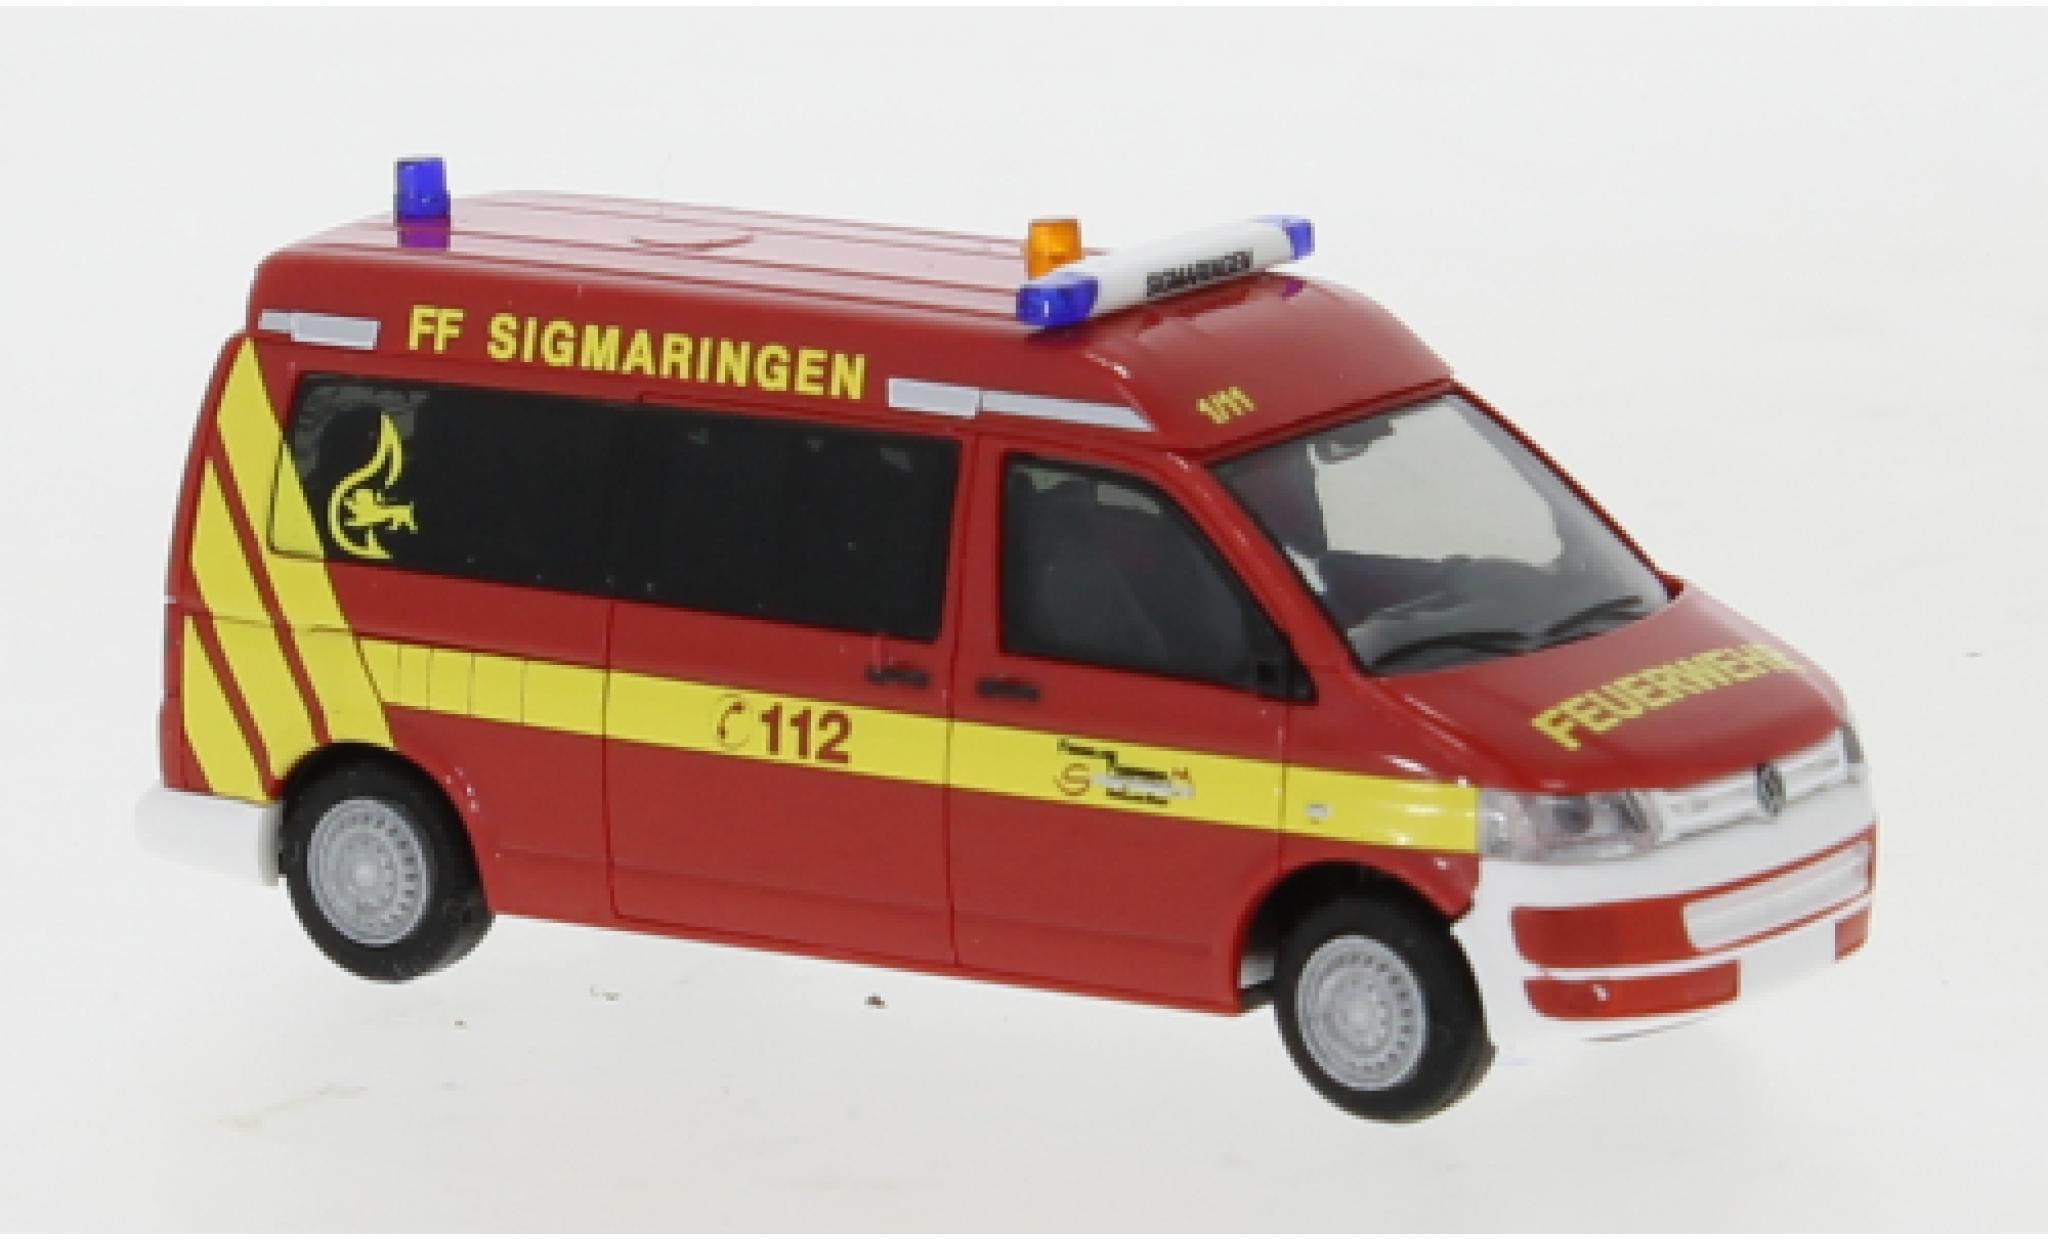 Volkswagen T5 1/87 Rietze Feuerwehr Sigmaringen 2010